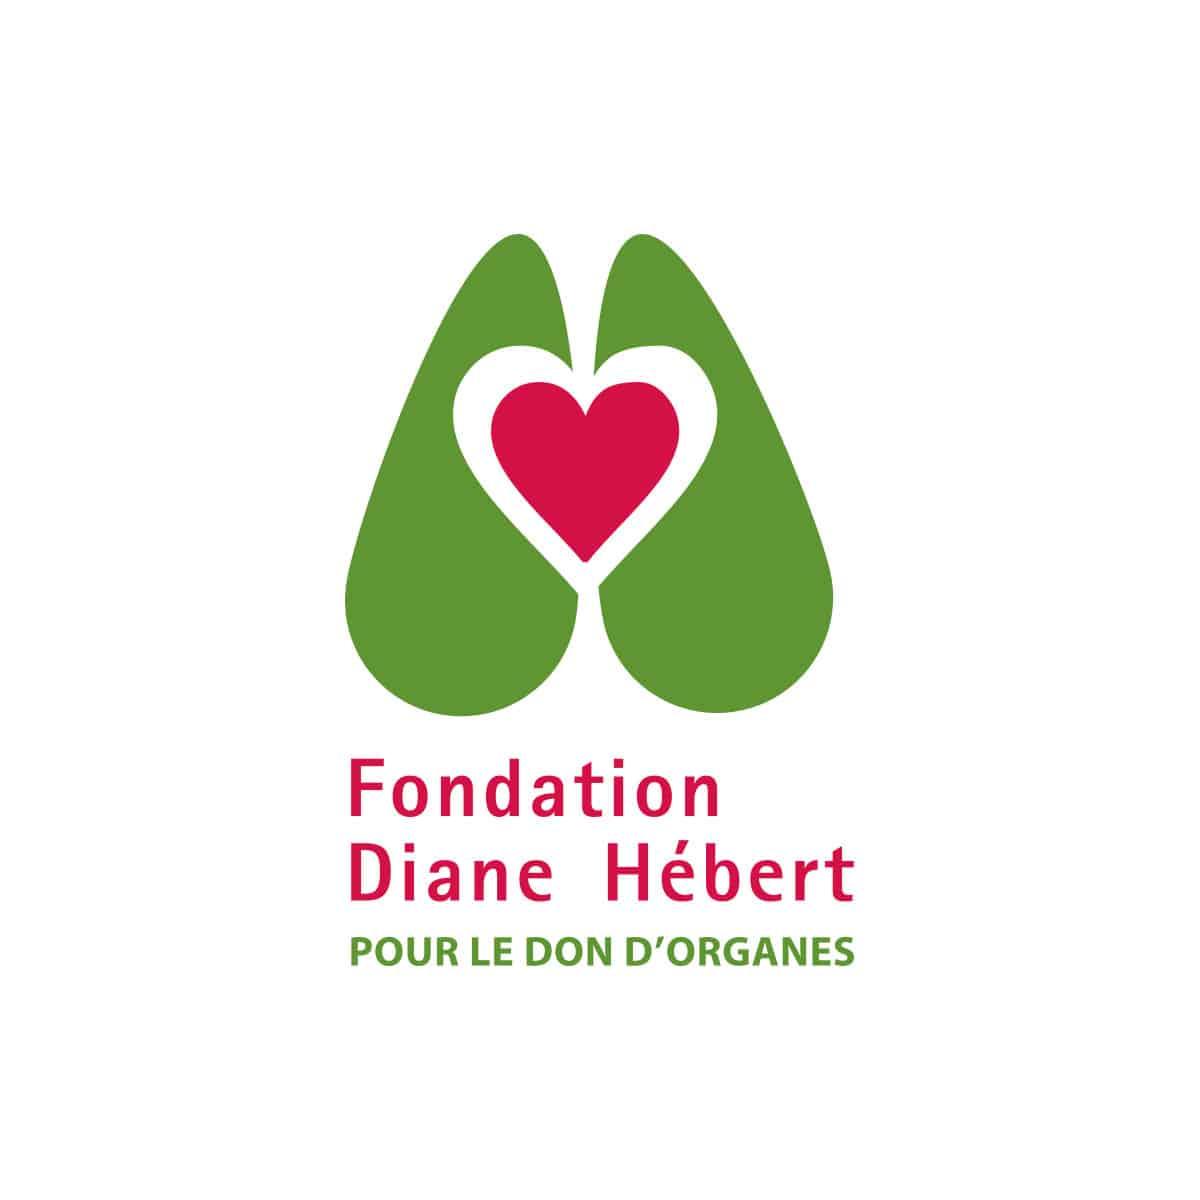 Logo Fondation Diane Hébert - Par Cyan Concept